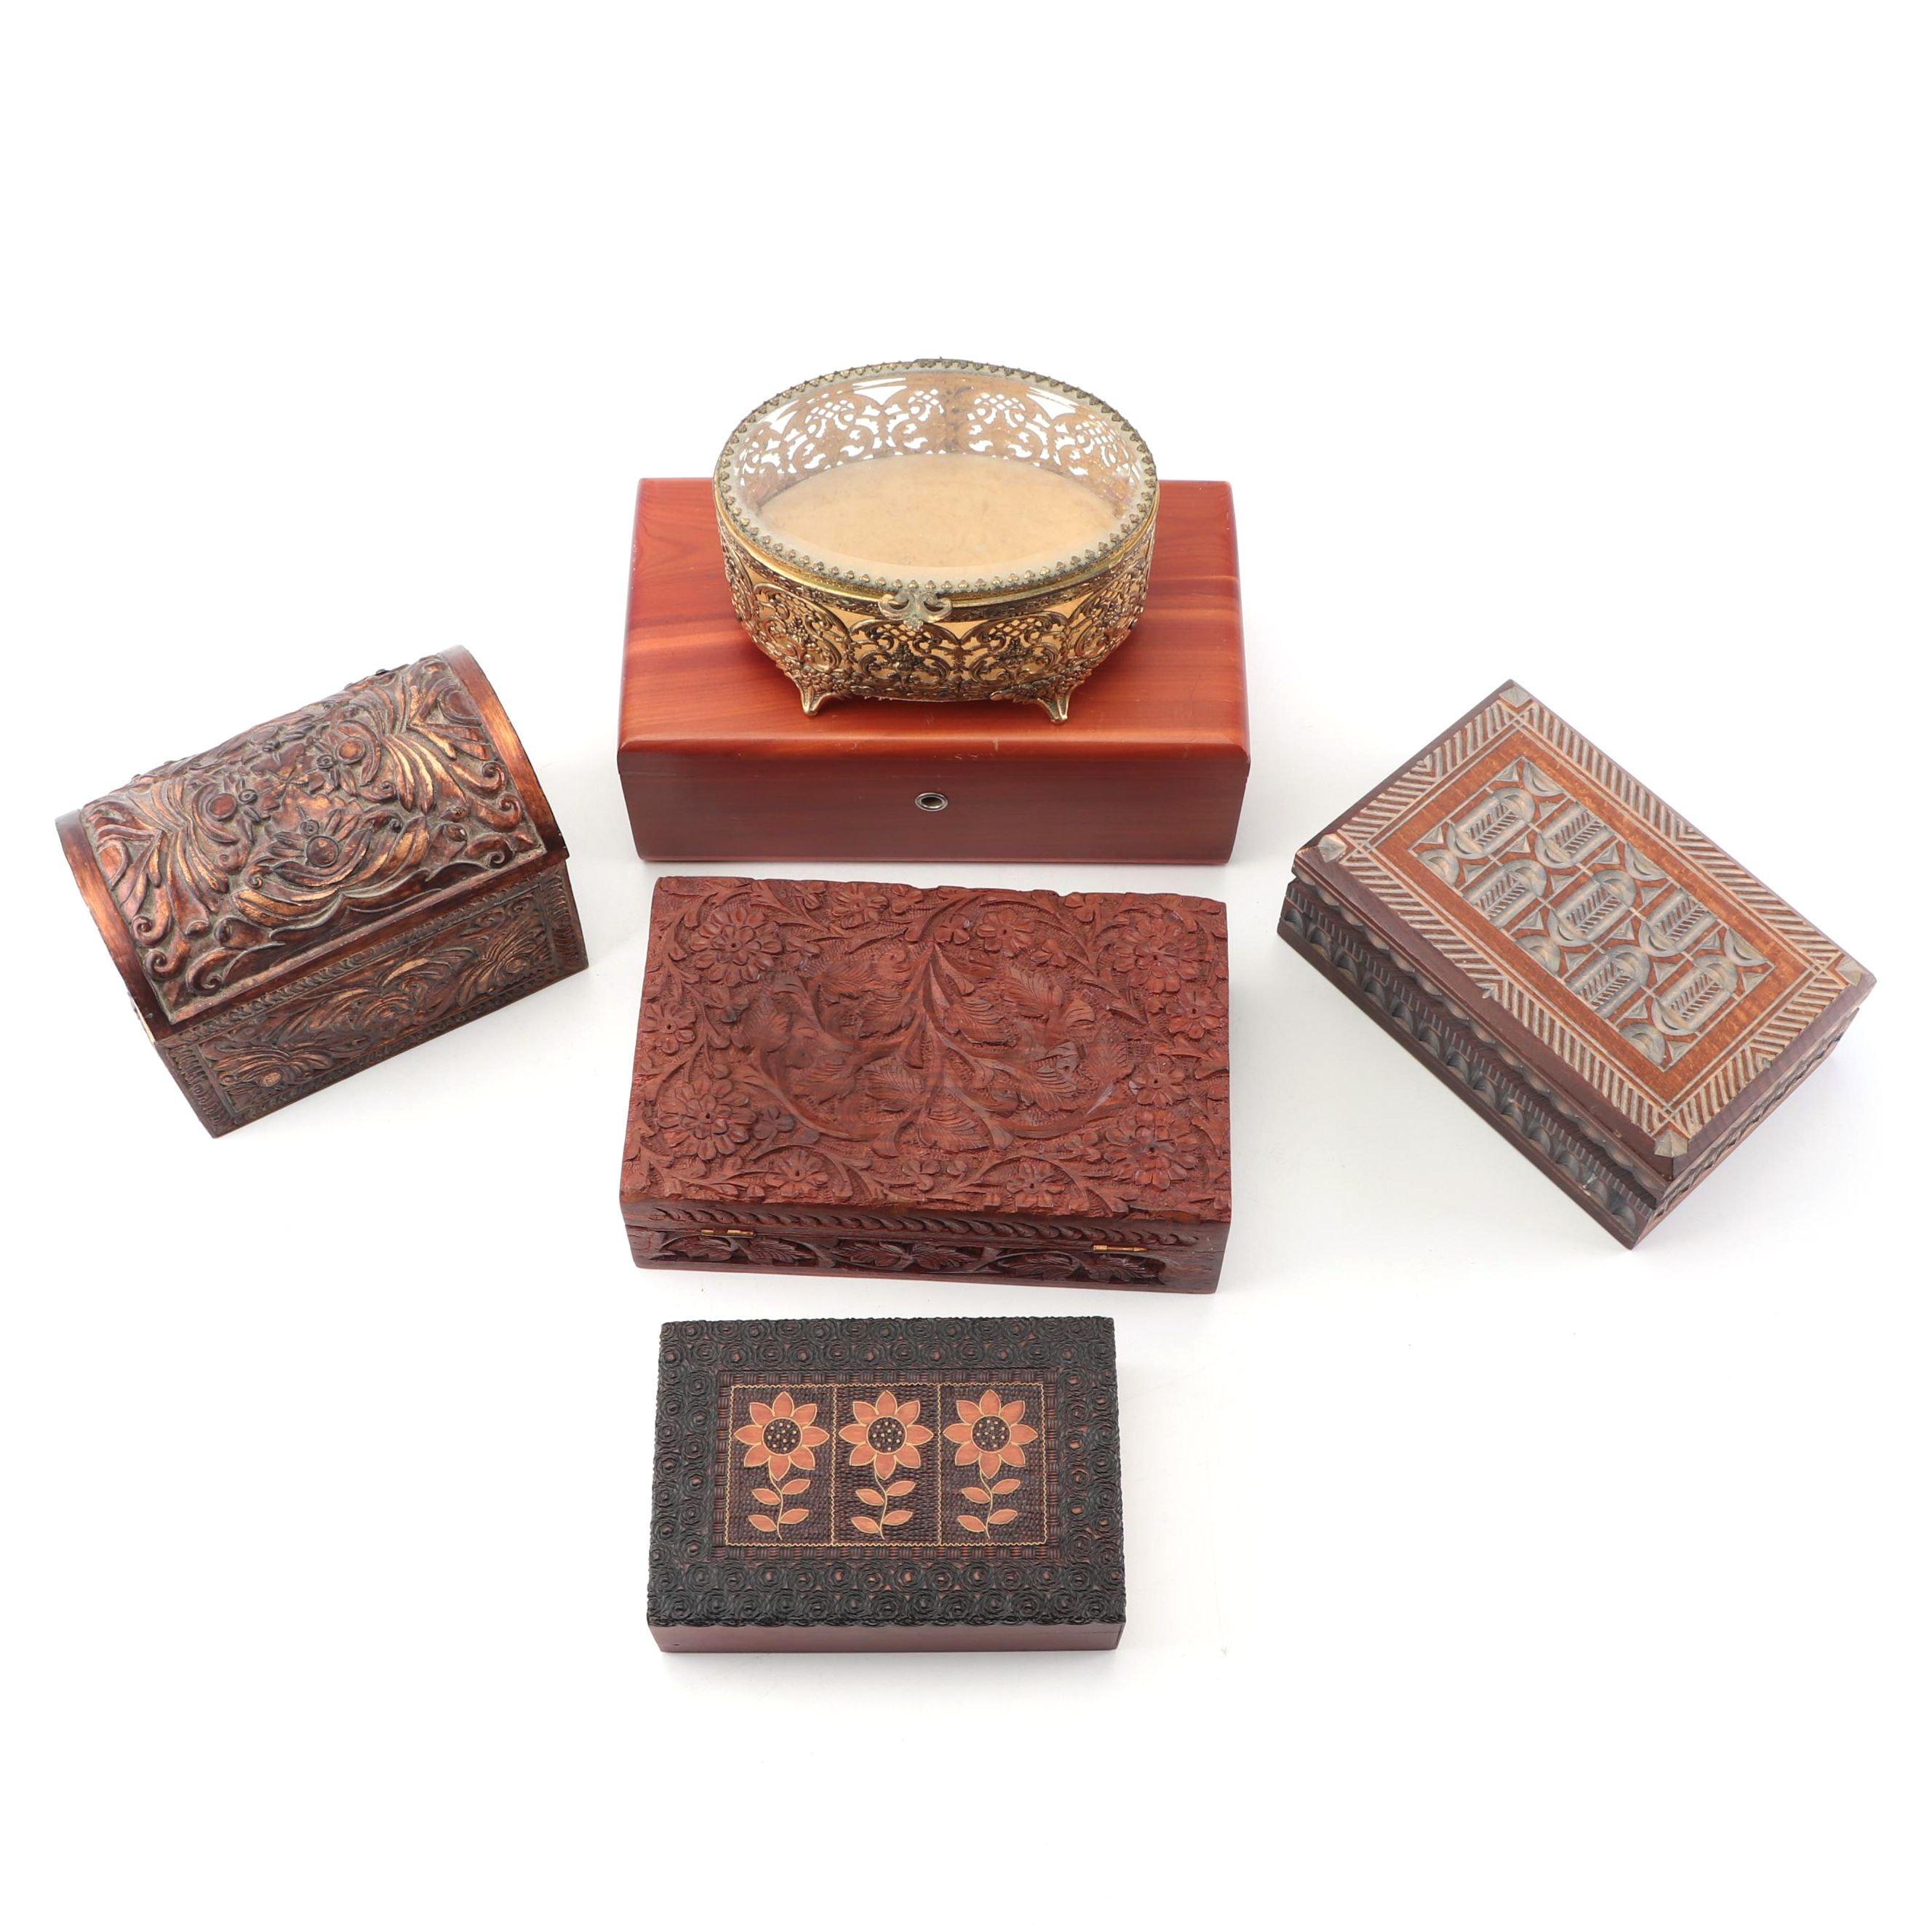 Trinket Boxes Including Lane Miniature Cedar Chest